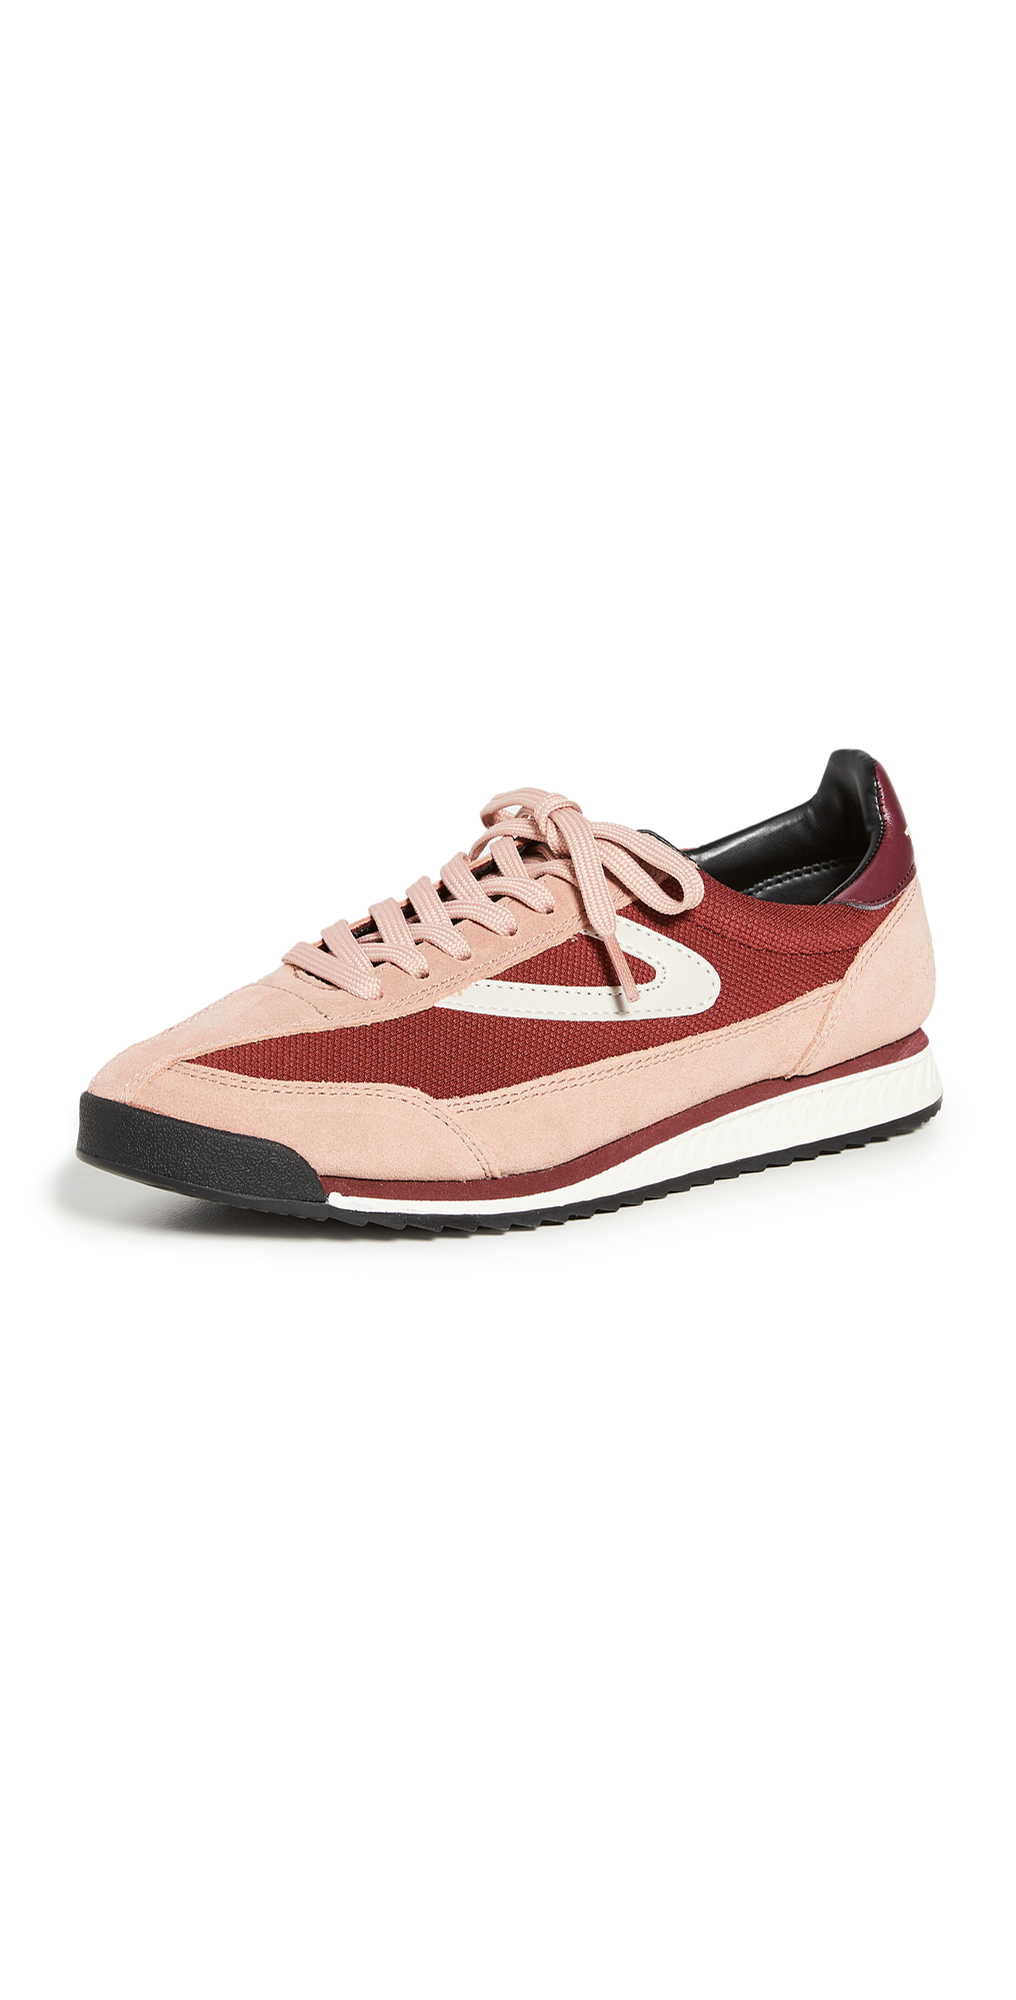 Tretorn Rawlins 8 Retro Jogger Sneakers